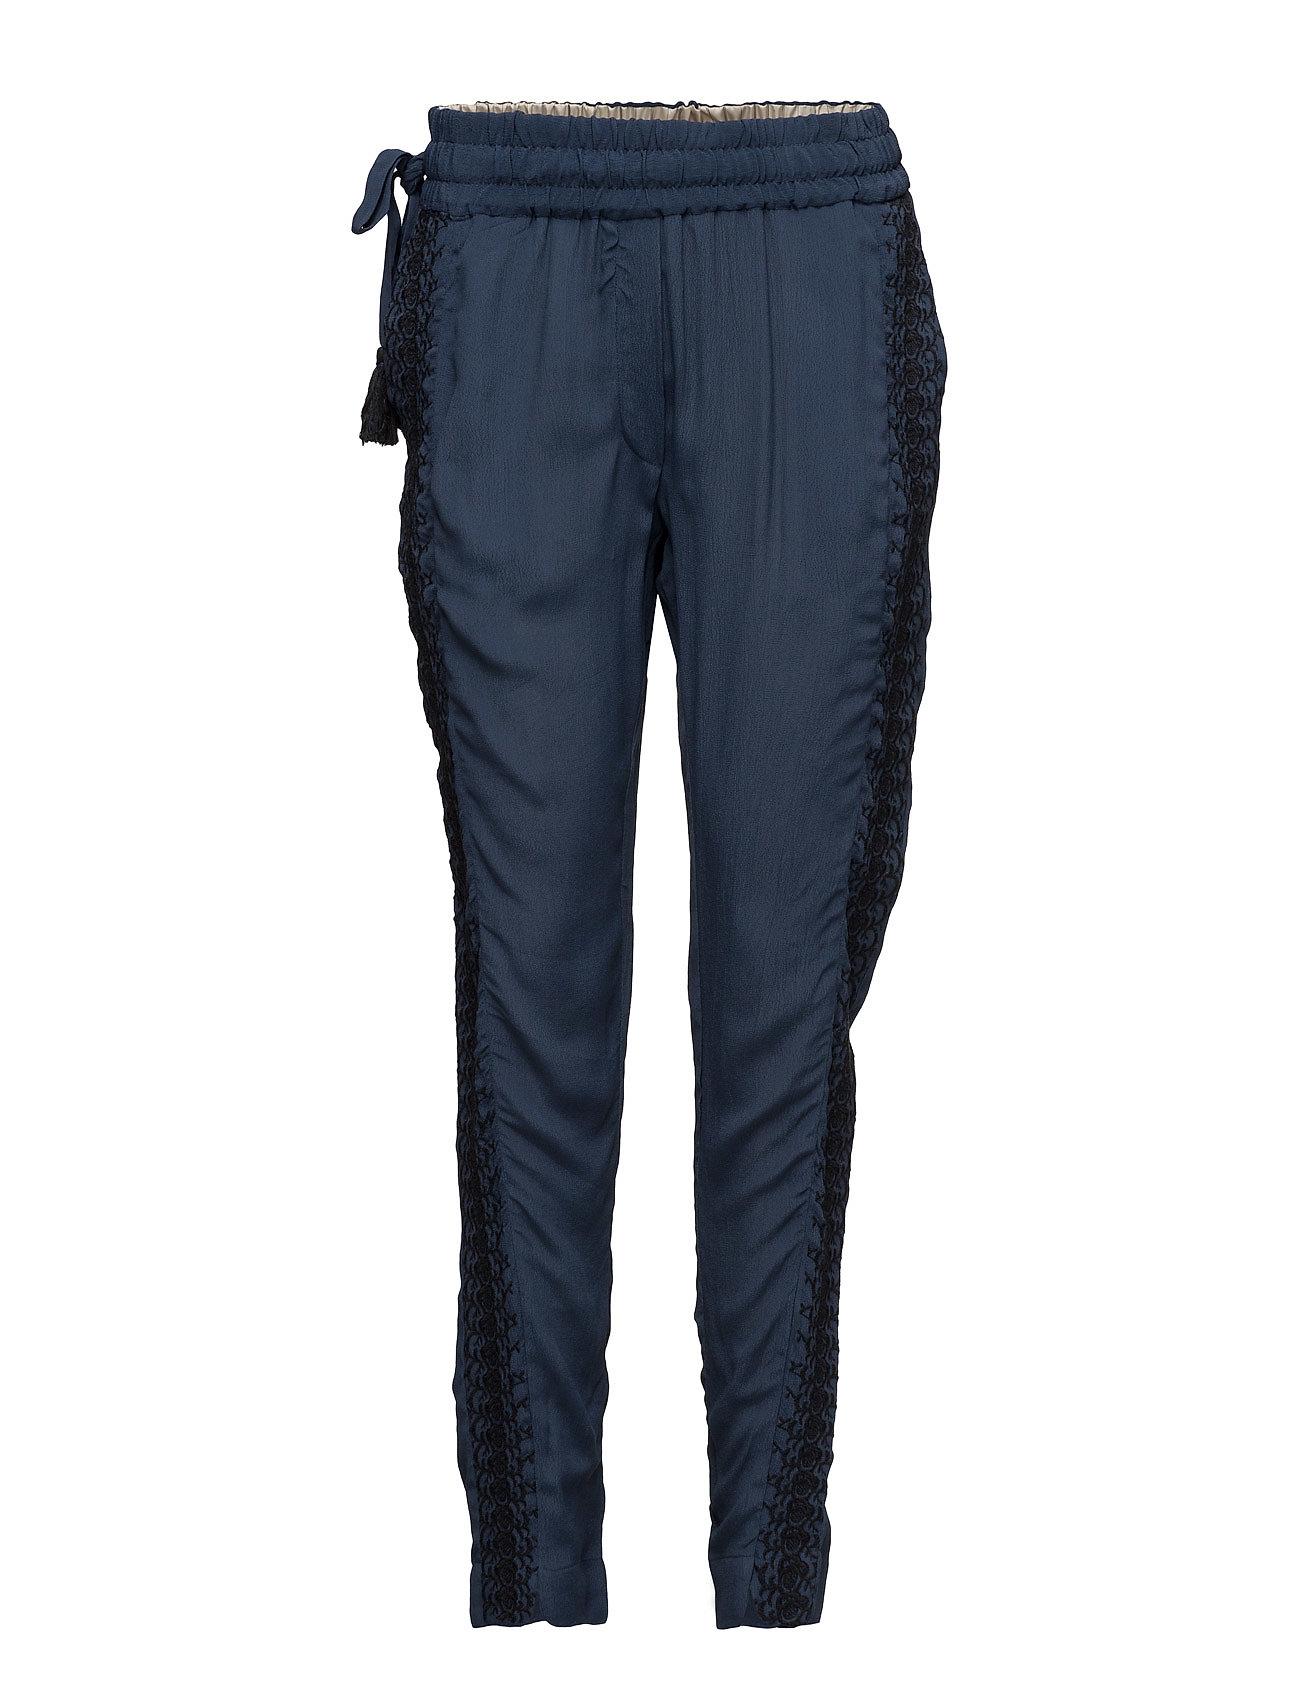 Trousers Noa Noa Casual bukser til Damer i Dress Blues